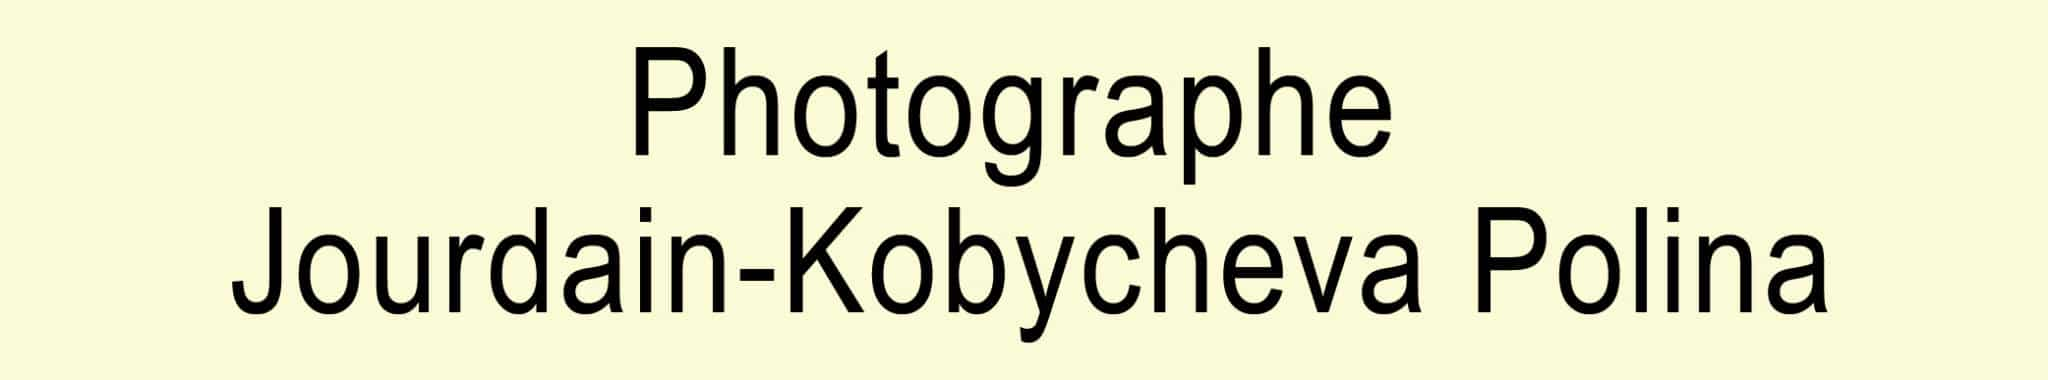 Photographe Jourdain-Kobycheva Polina